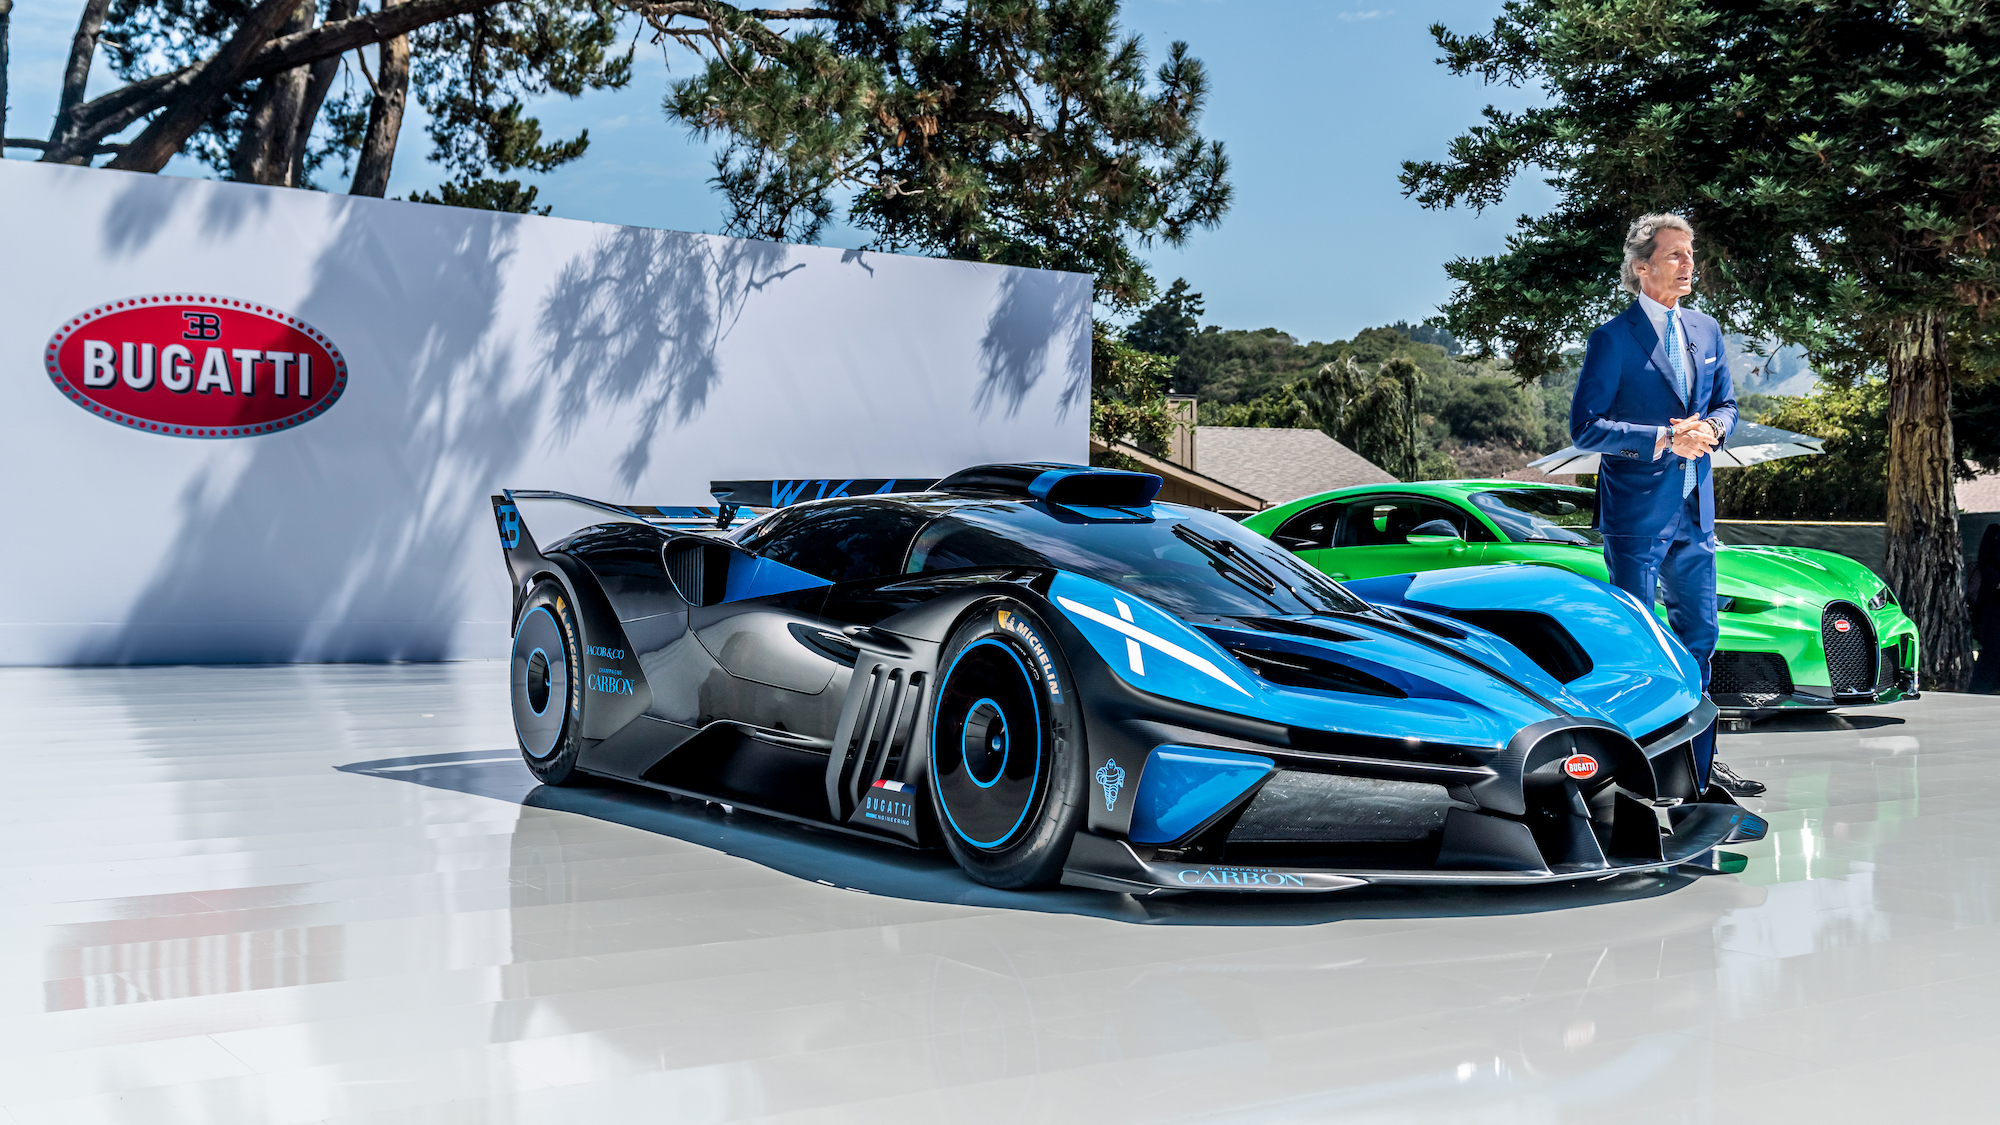 Bugatti Bolide unveiled at The Quail, Monterey Car Week